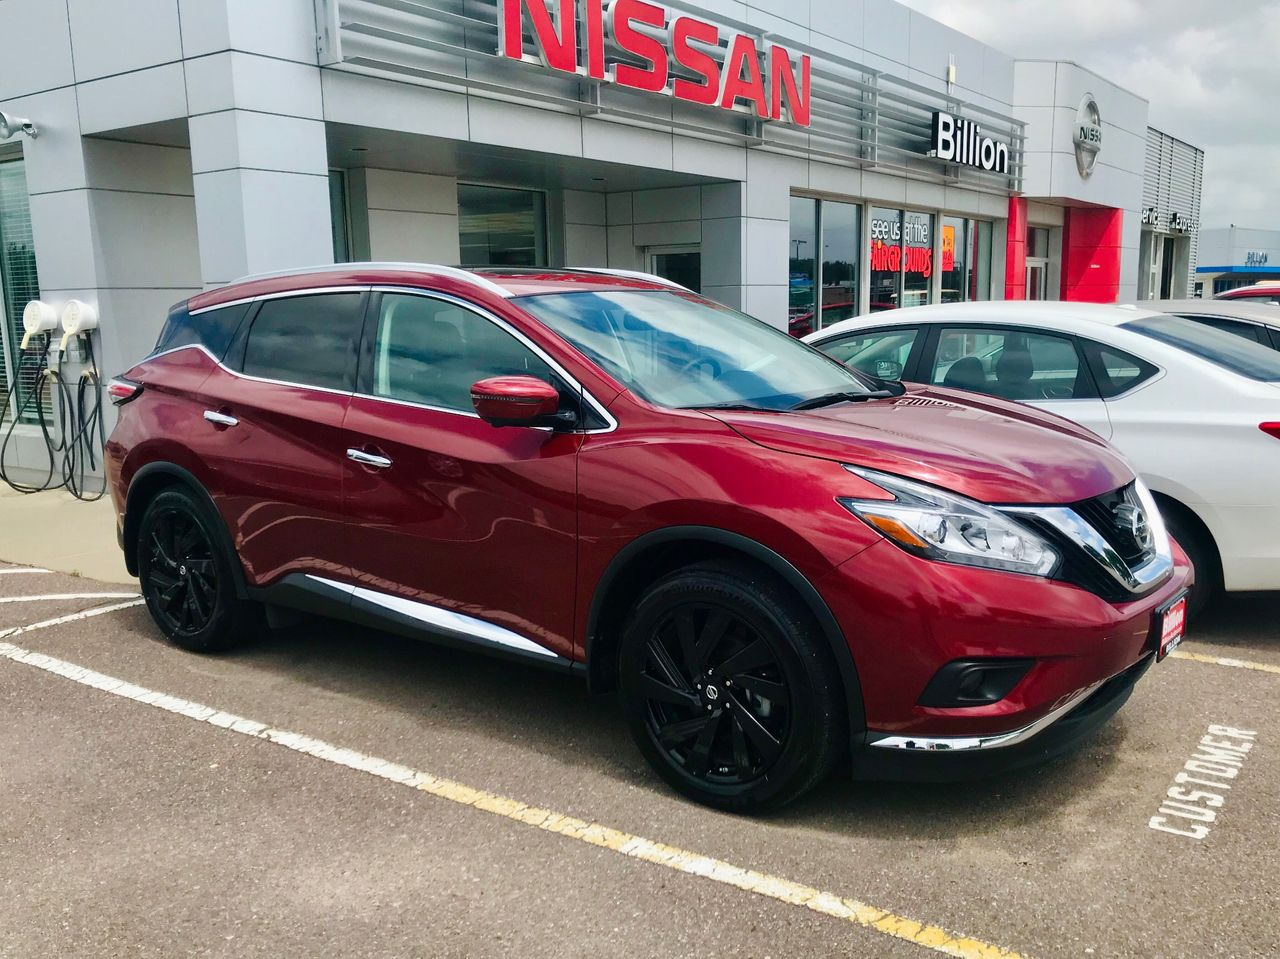 2018 Nissan Murano Platinum | Brandon, SD, Cayenne Red (Red), All Wheel